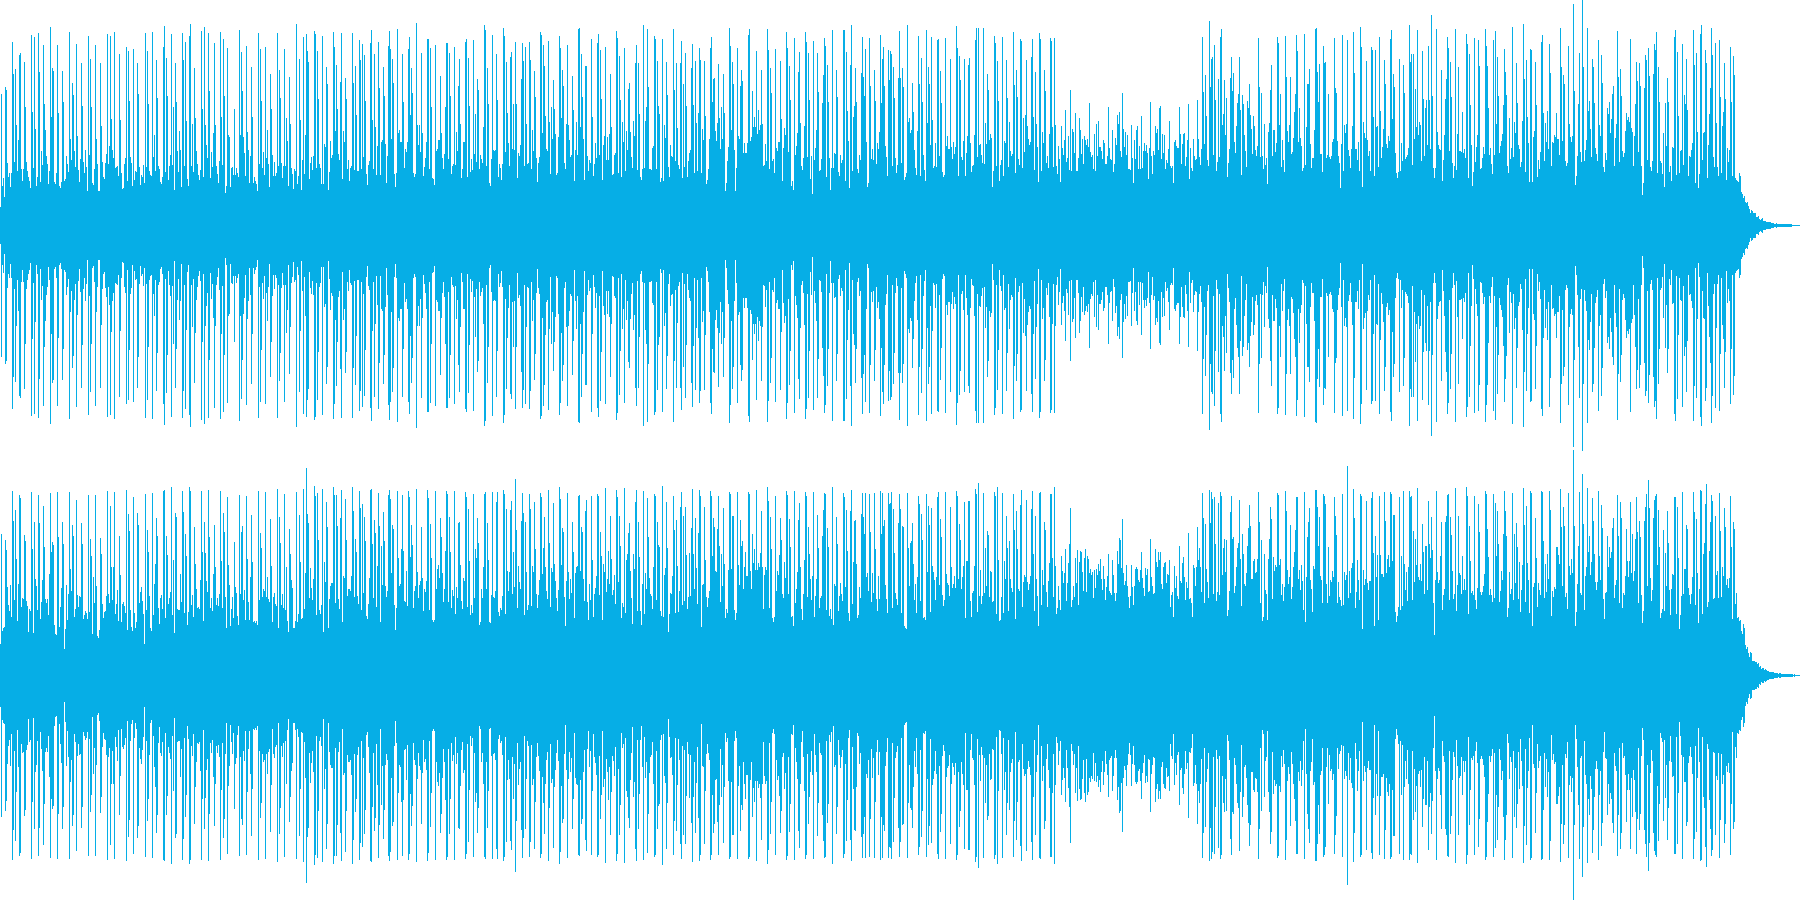 enordの再生済みの波形